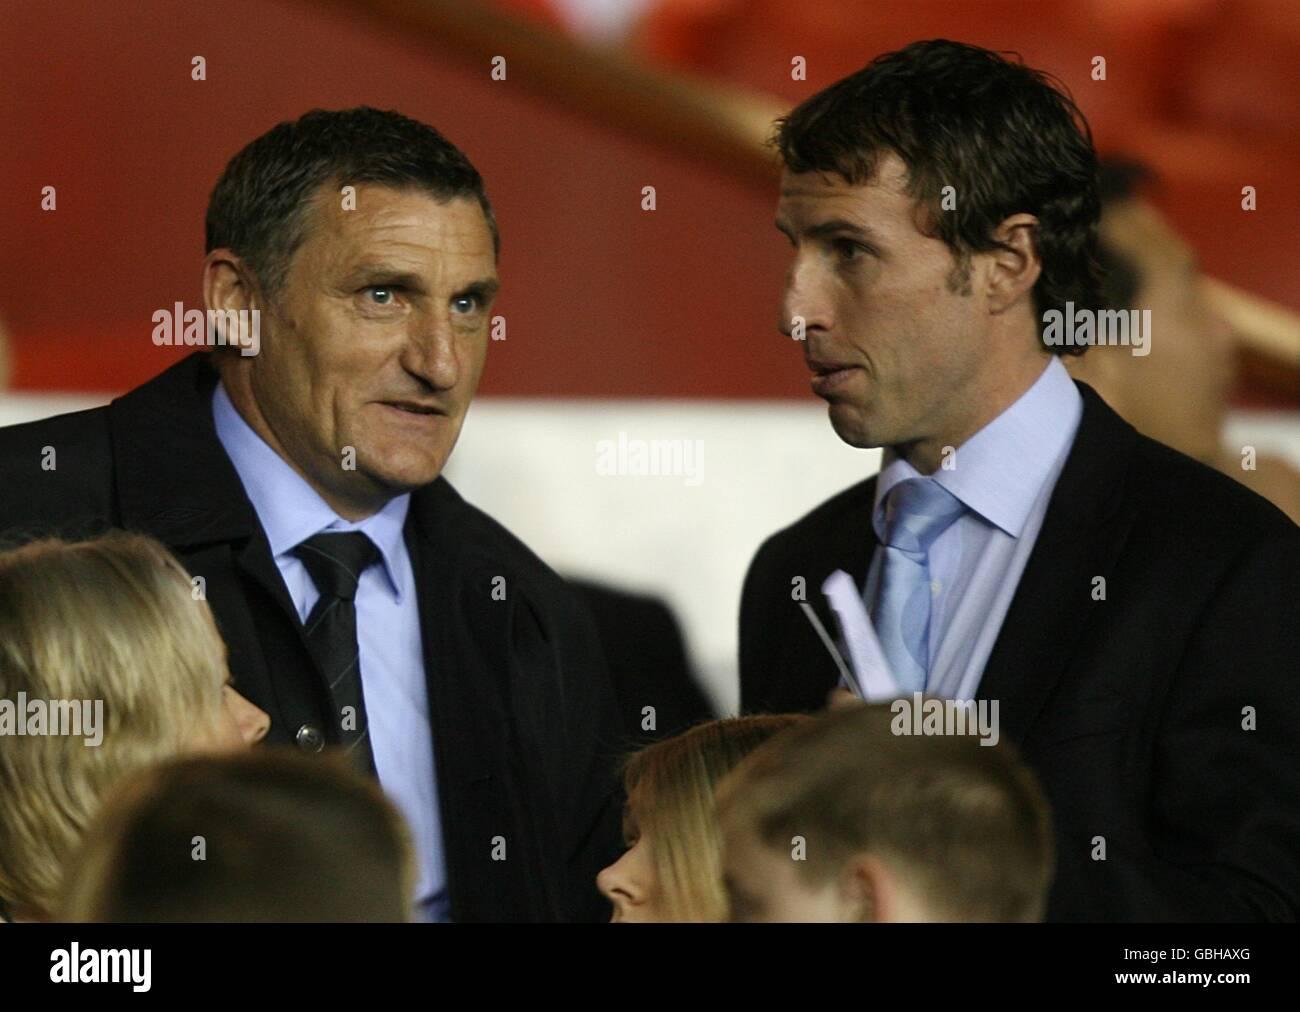 Soccer - Under 21 International Friendly - England v France - City Ground - Stock Image